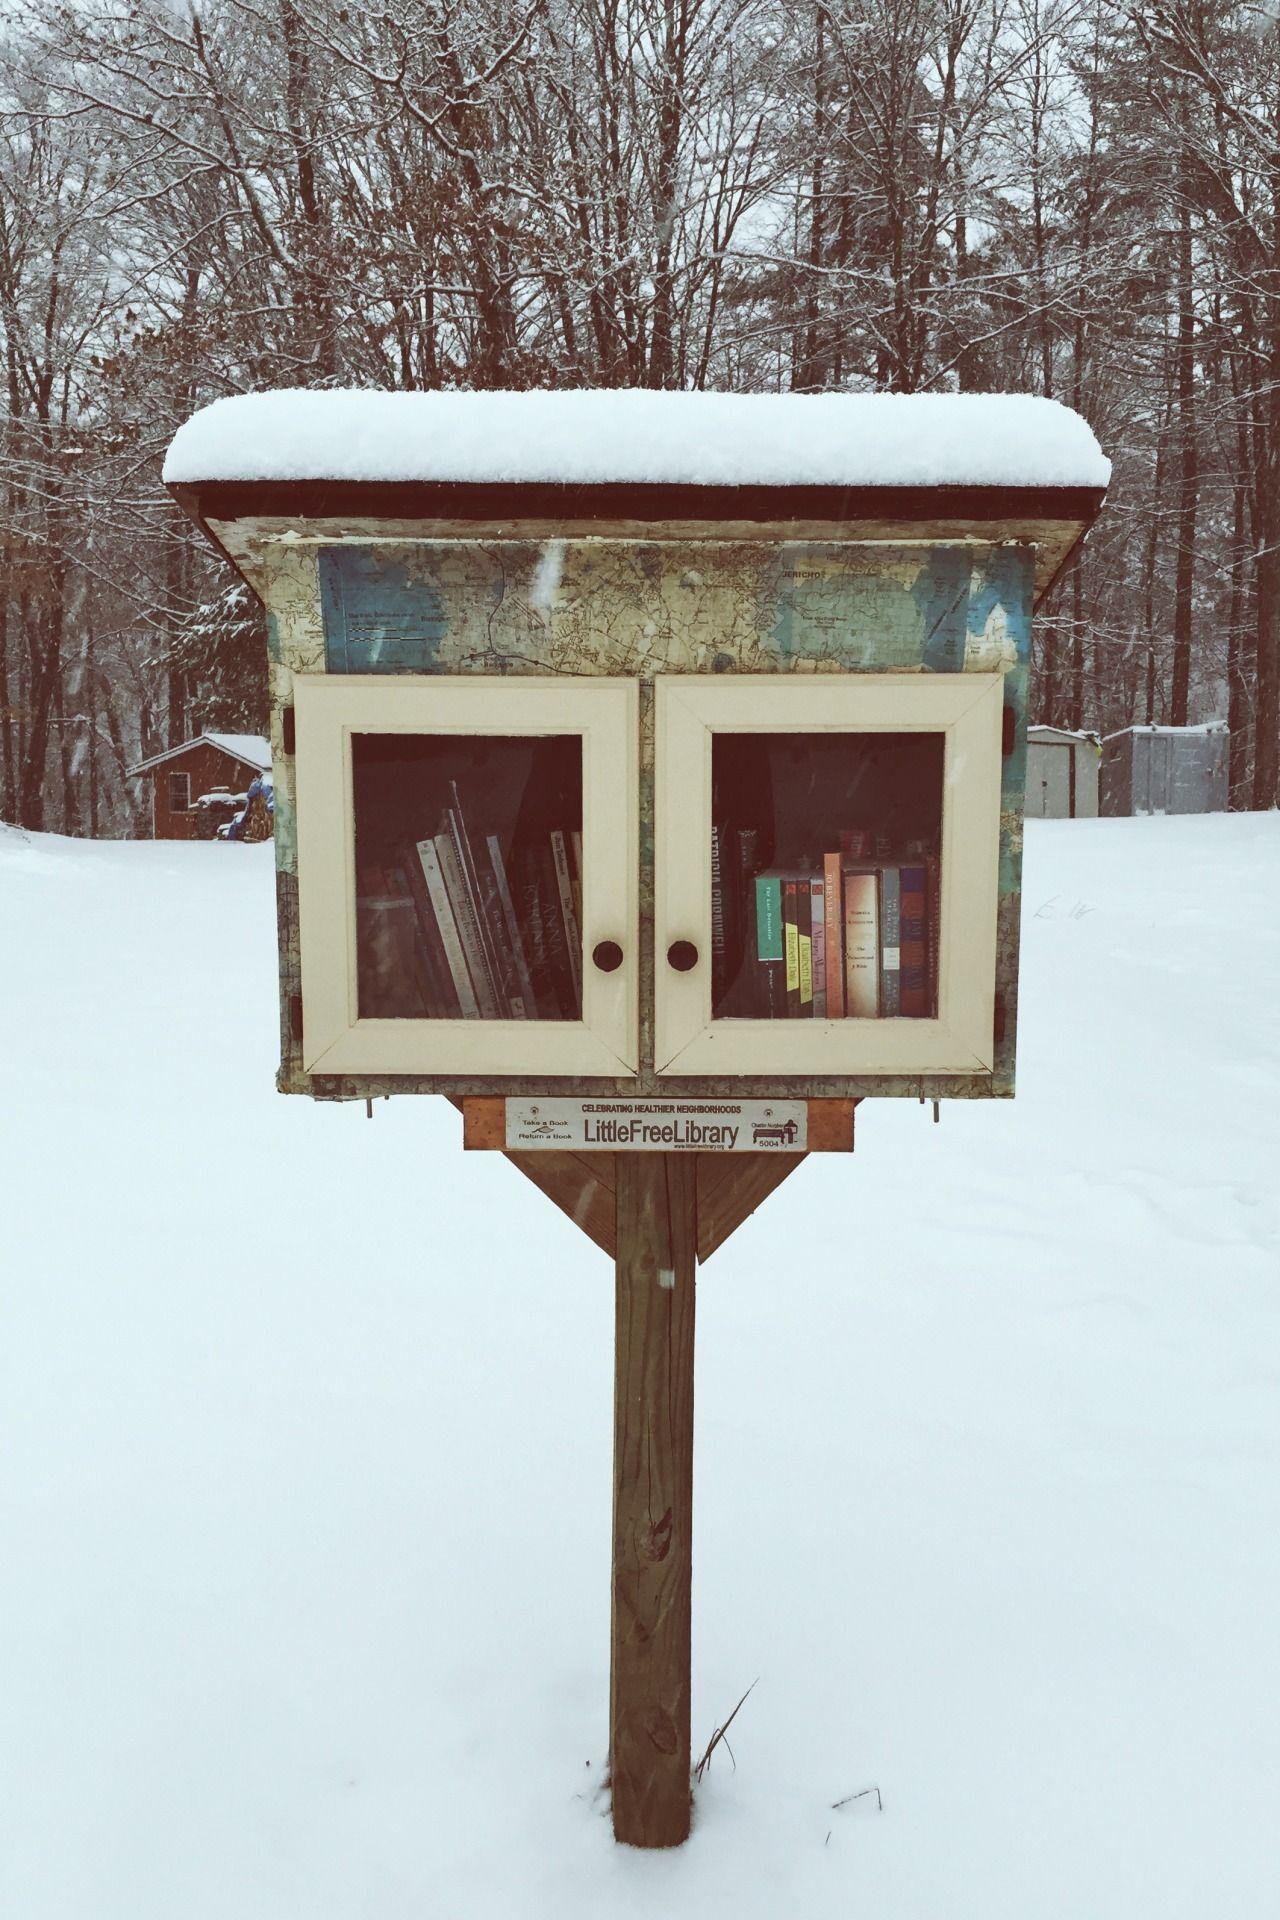 kalebattle: My neighborhood's Little Free Library! I'm happy to...